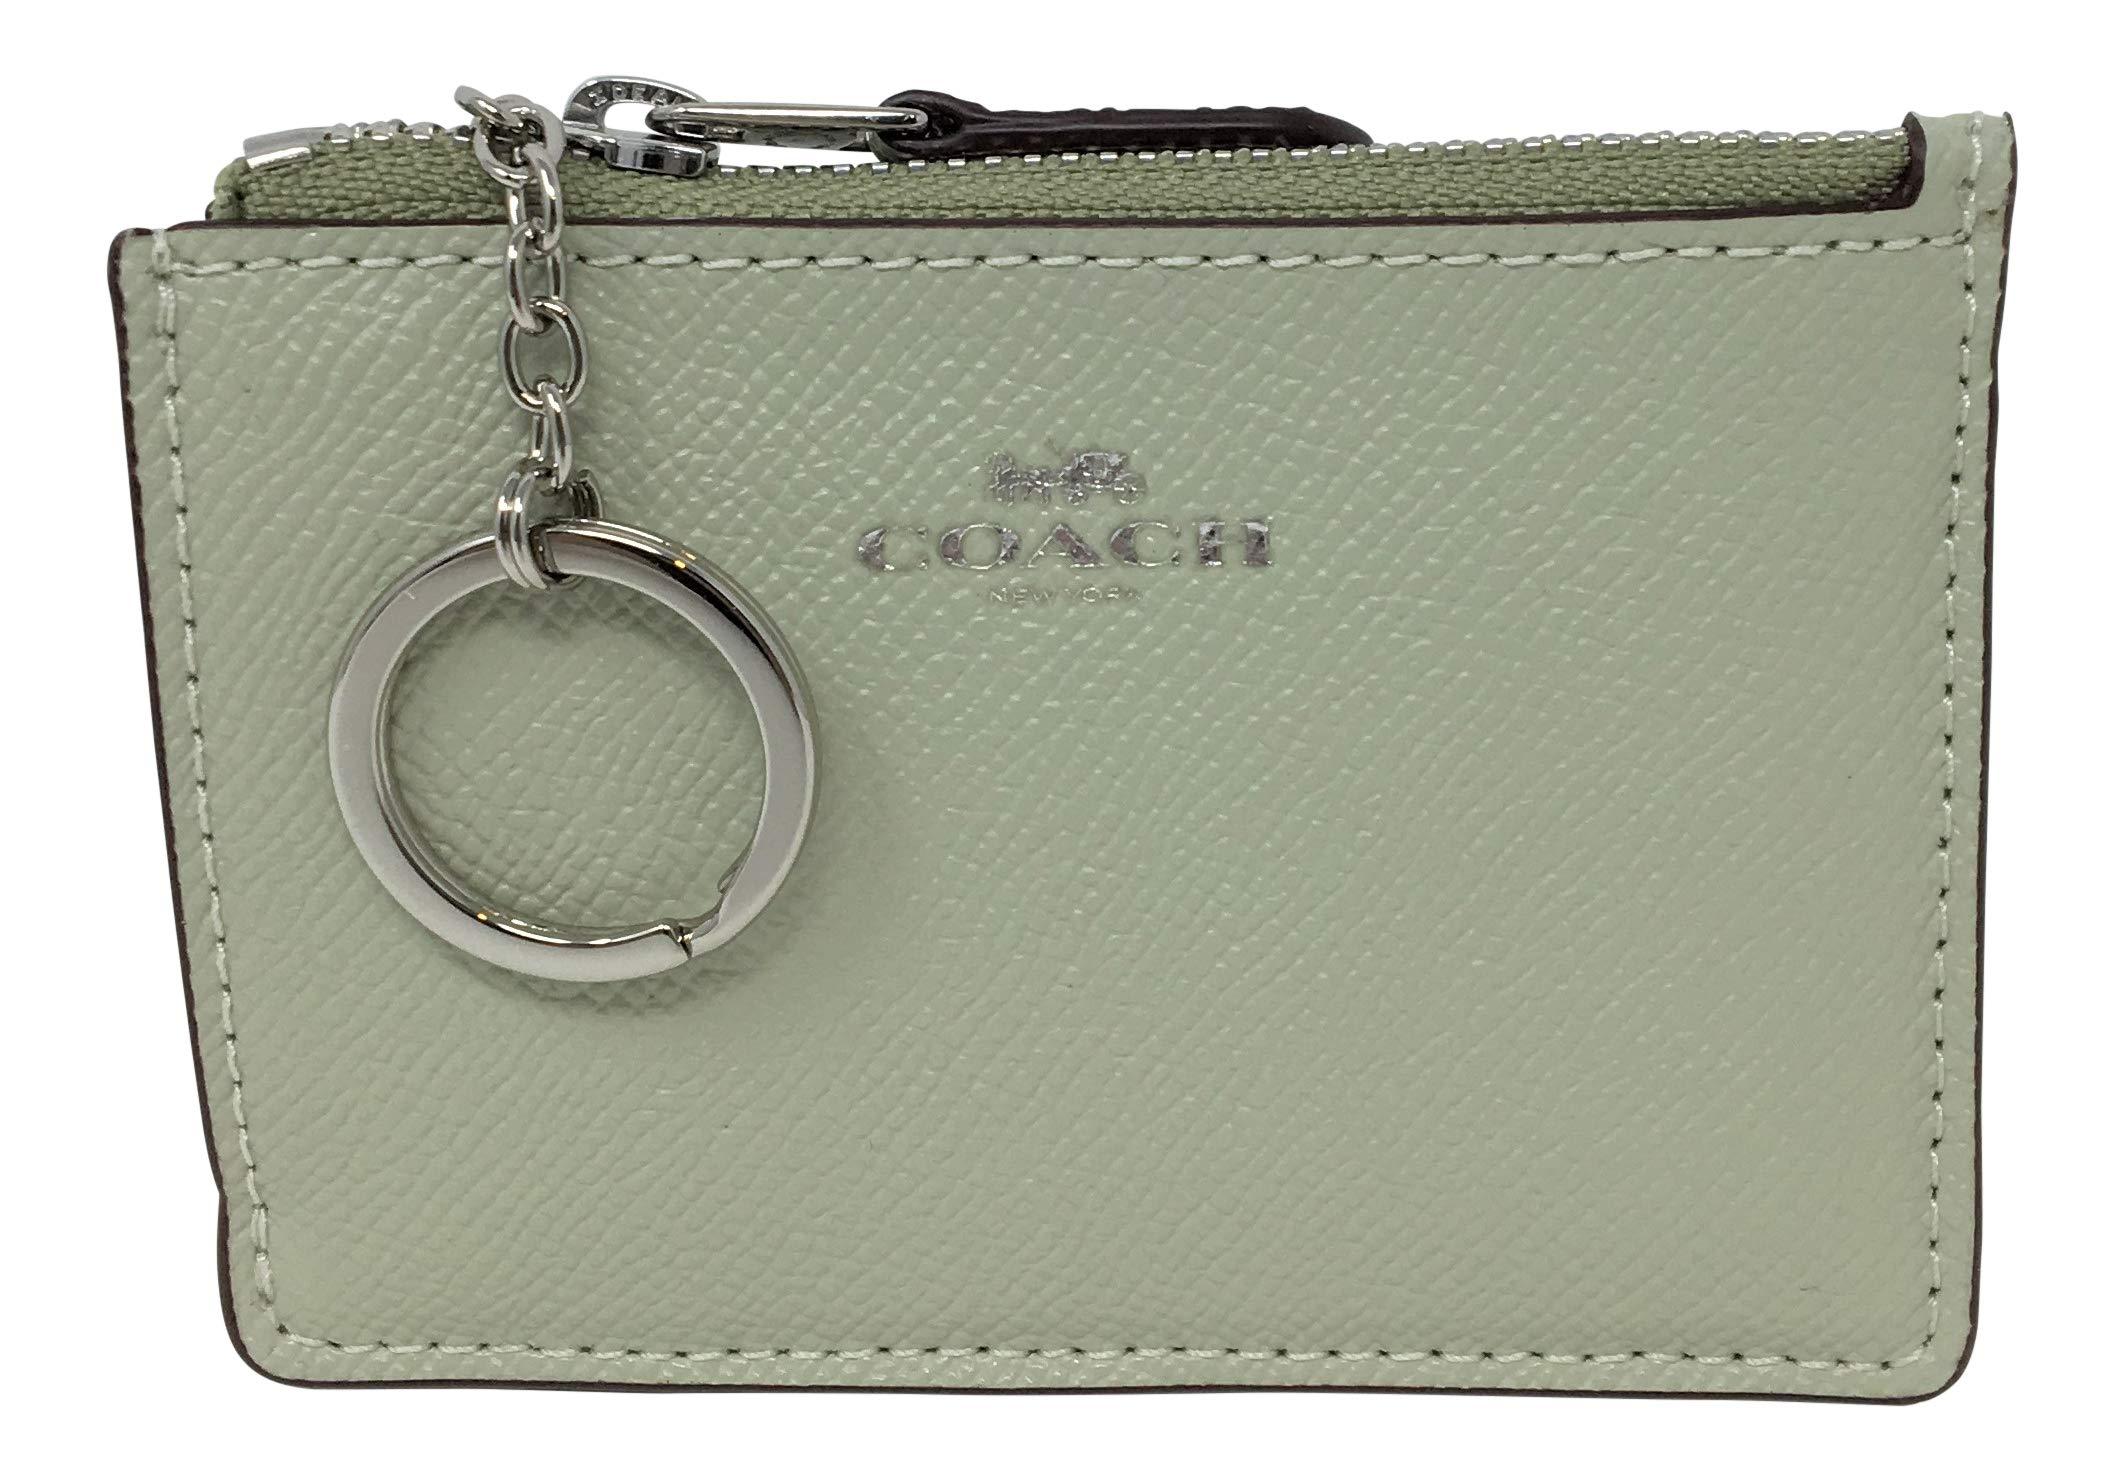 Coach F12186 Mini Skinny ID Case In Crossgrain Leather Pale Green by COACH